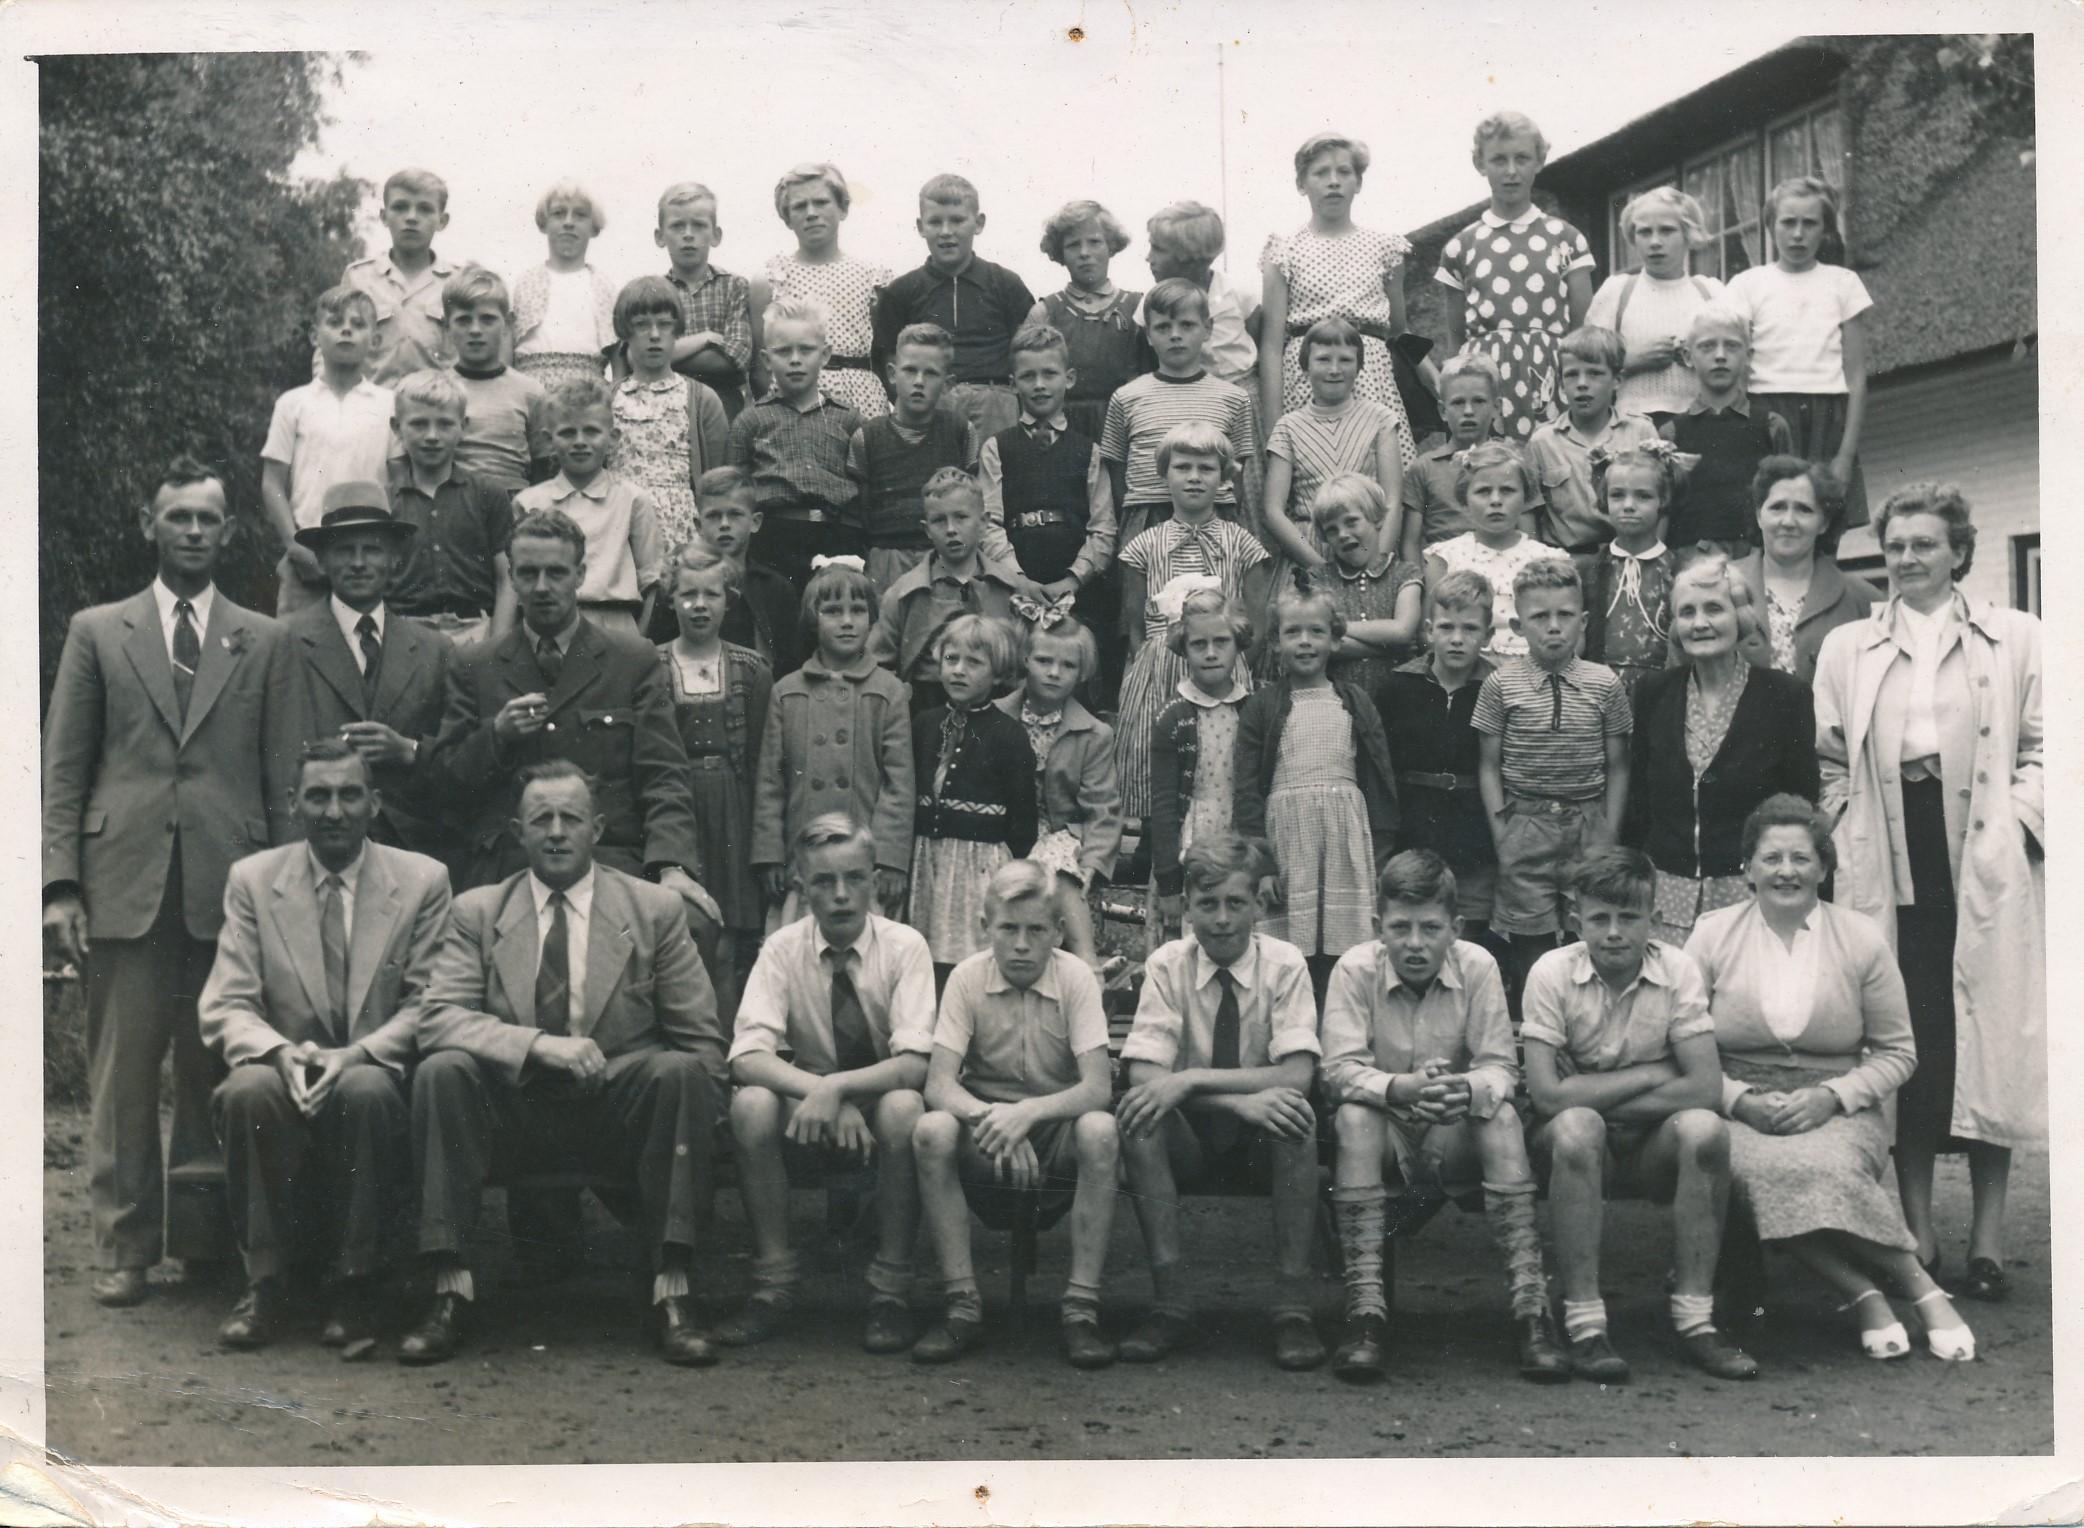 Fotoalbum Eddie Groen, 017, Skoalfoto 1955